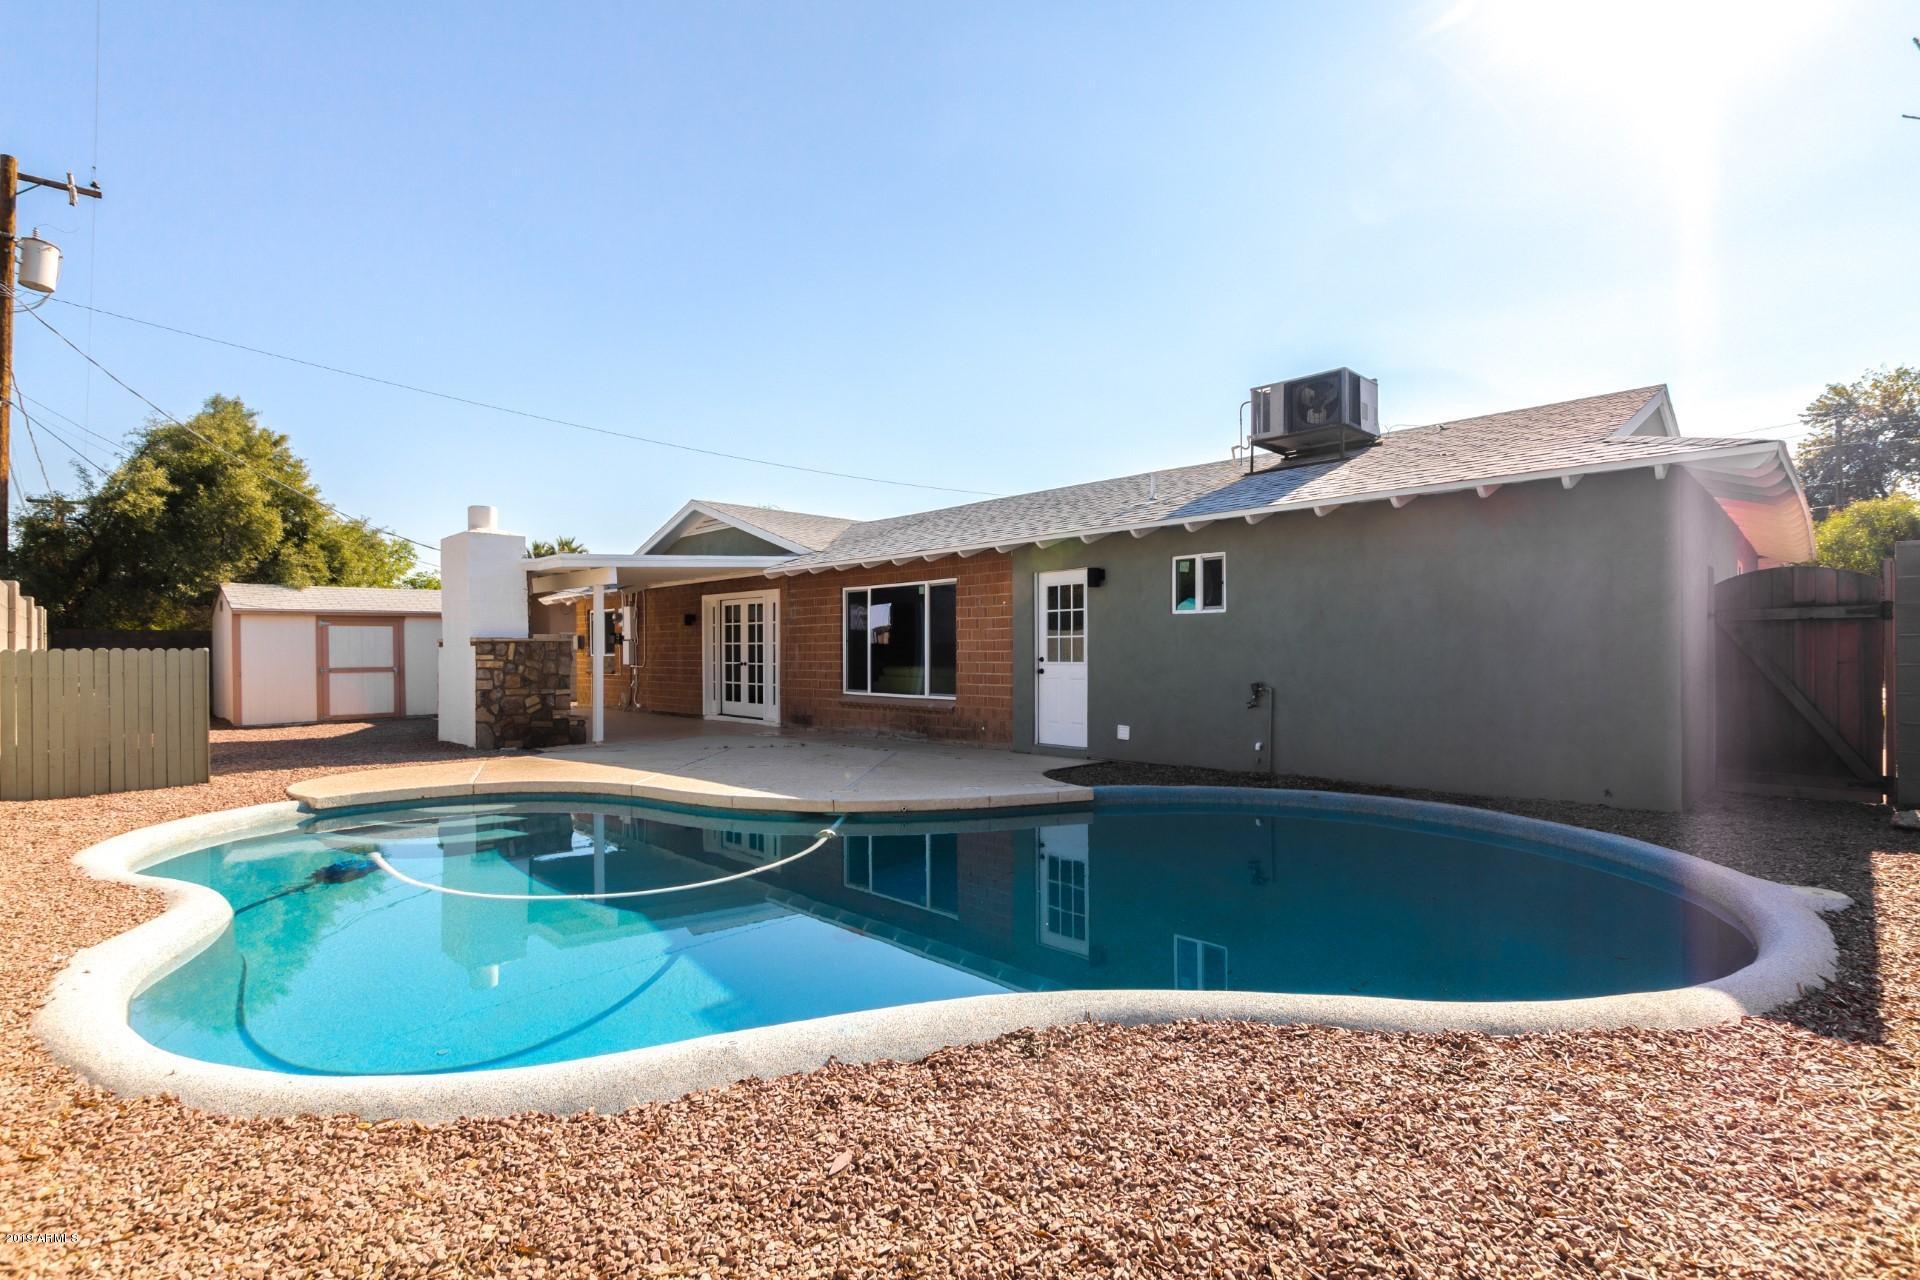 MLS 5864704 8528 E OAK Street, Scottsdale, AZ 85257 Scottsdale AZ Scottsdale Estates